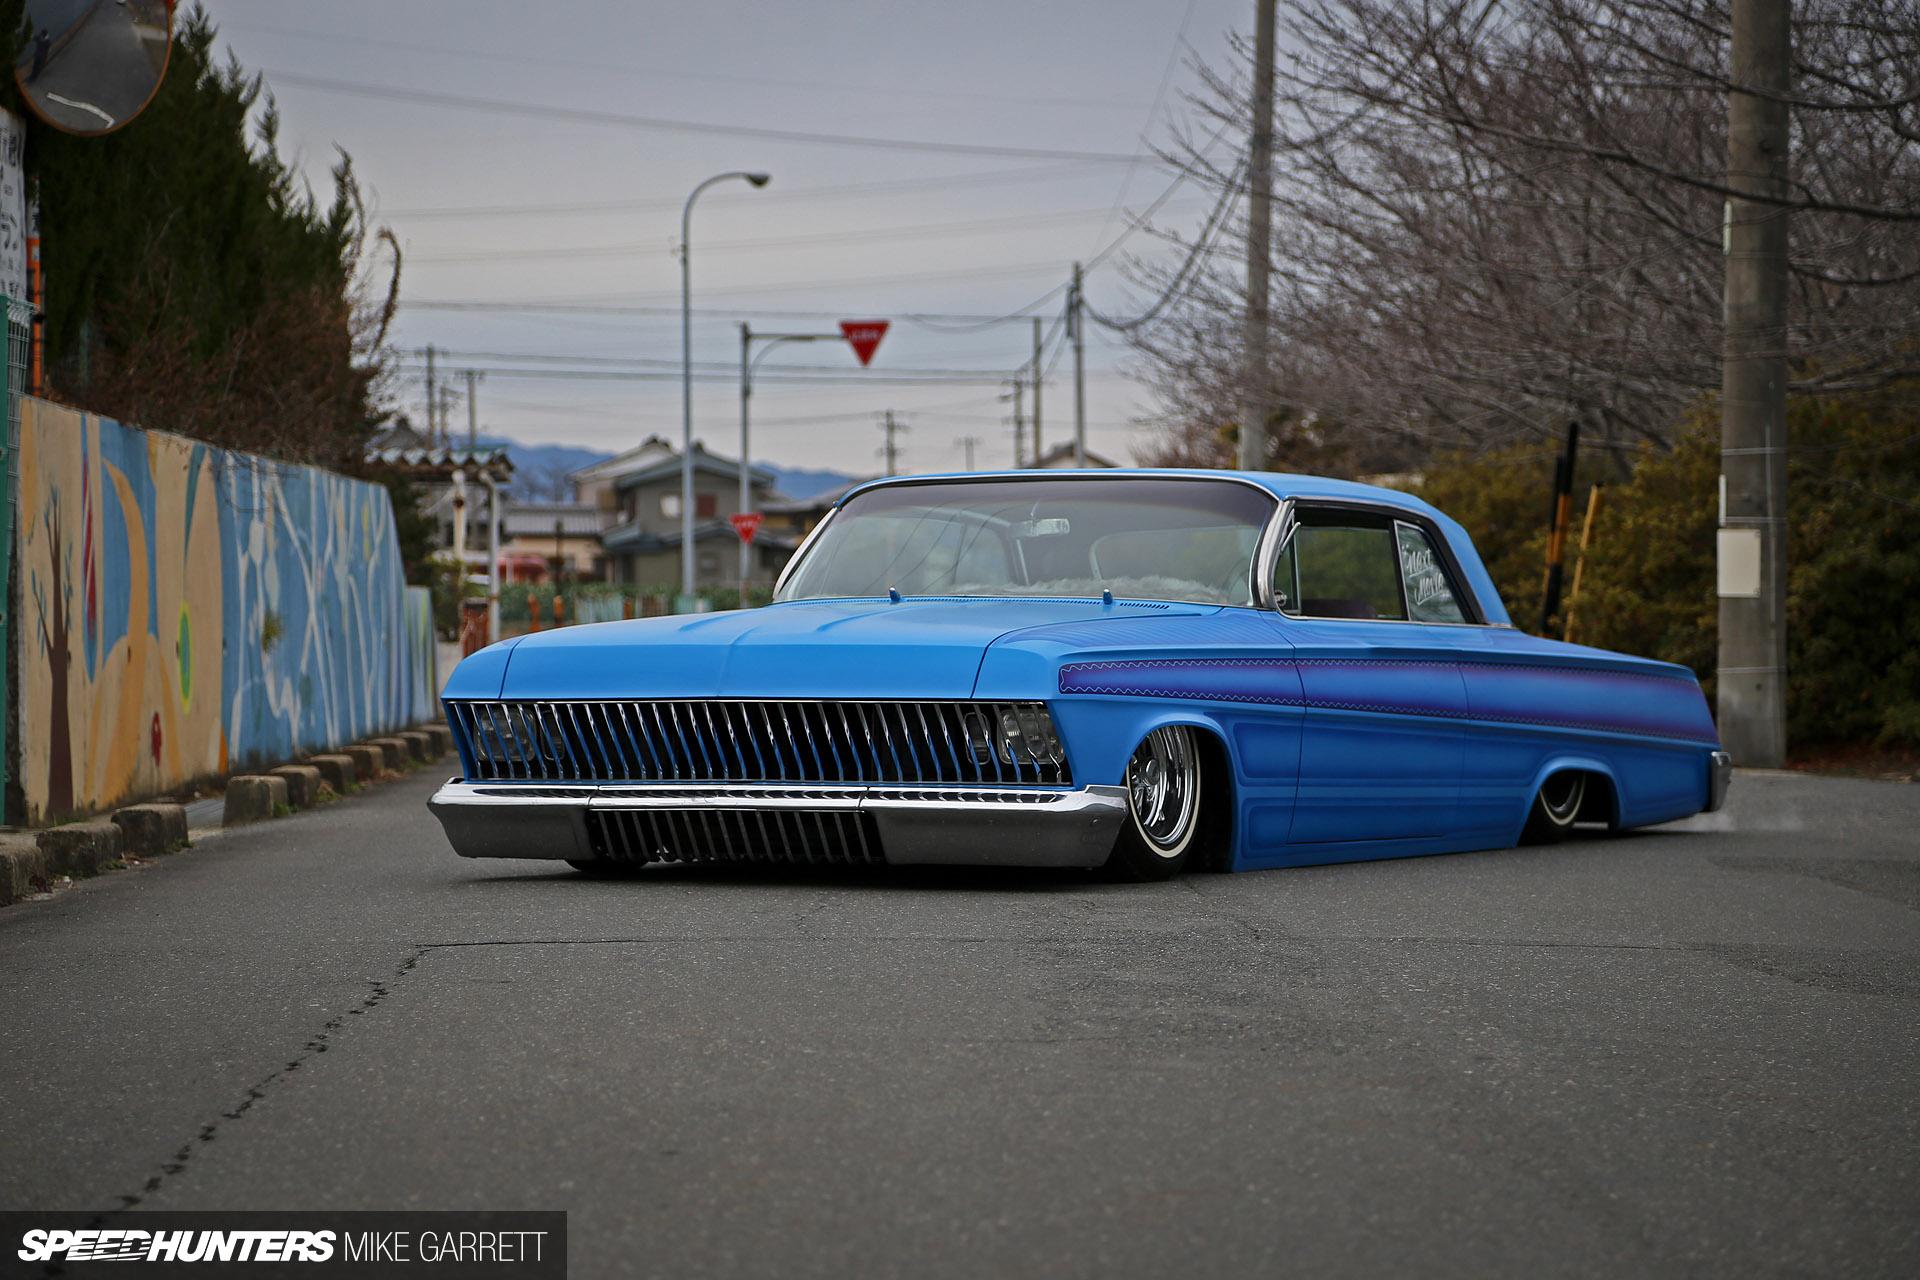 The Car Movie 1977 Wallpaper Impala Ichiban La Street Style In Japan Speedhunters